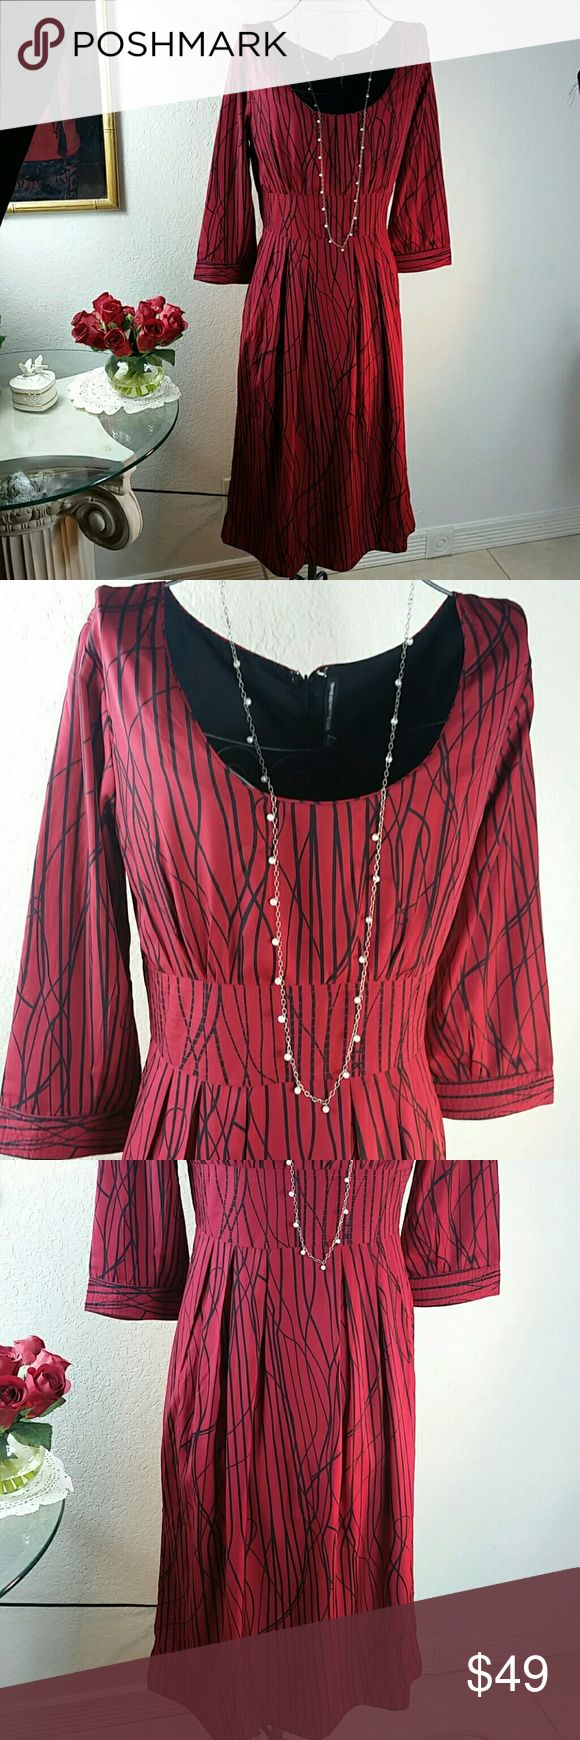 Valentine WALTER BAKER Red dress with black lines Pretty red dress with black lines throughout the dress Walter Baker Dresses